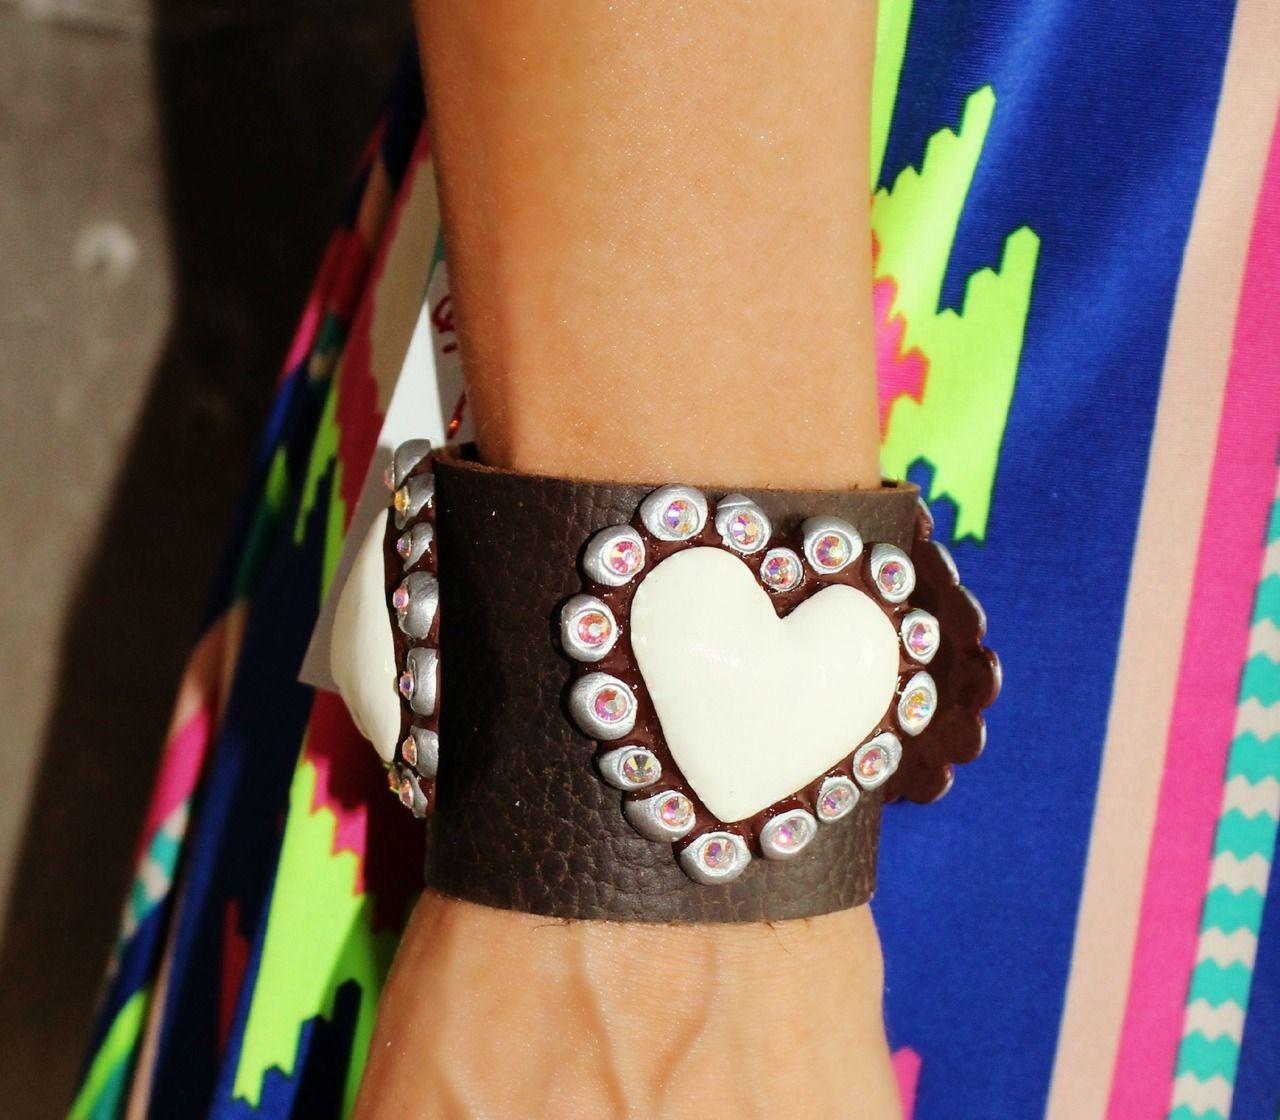 Sookie Sookie Tres Corazon PLAIN Leather Cuff - The Lace Cactus